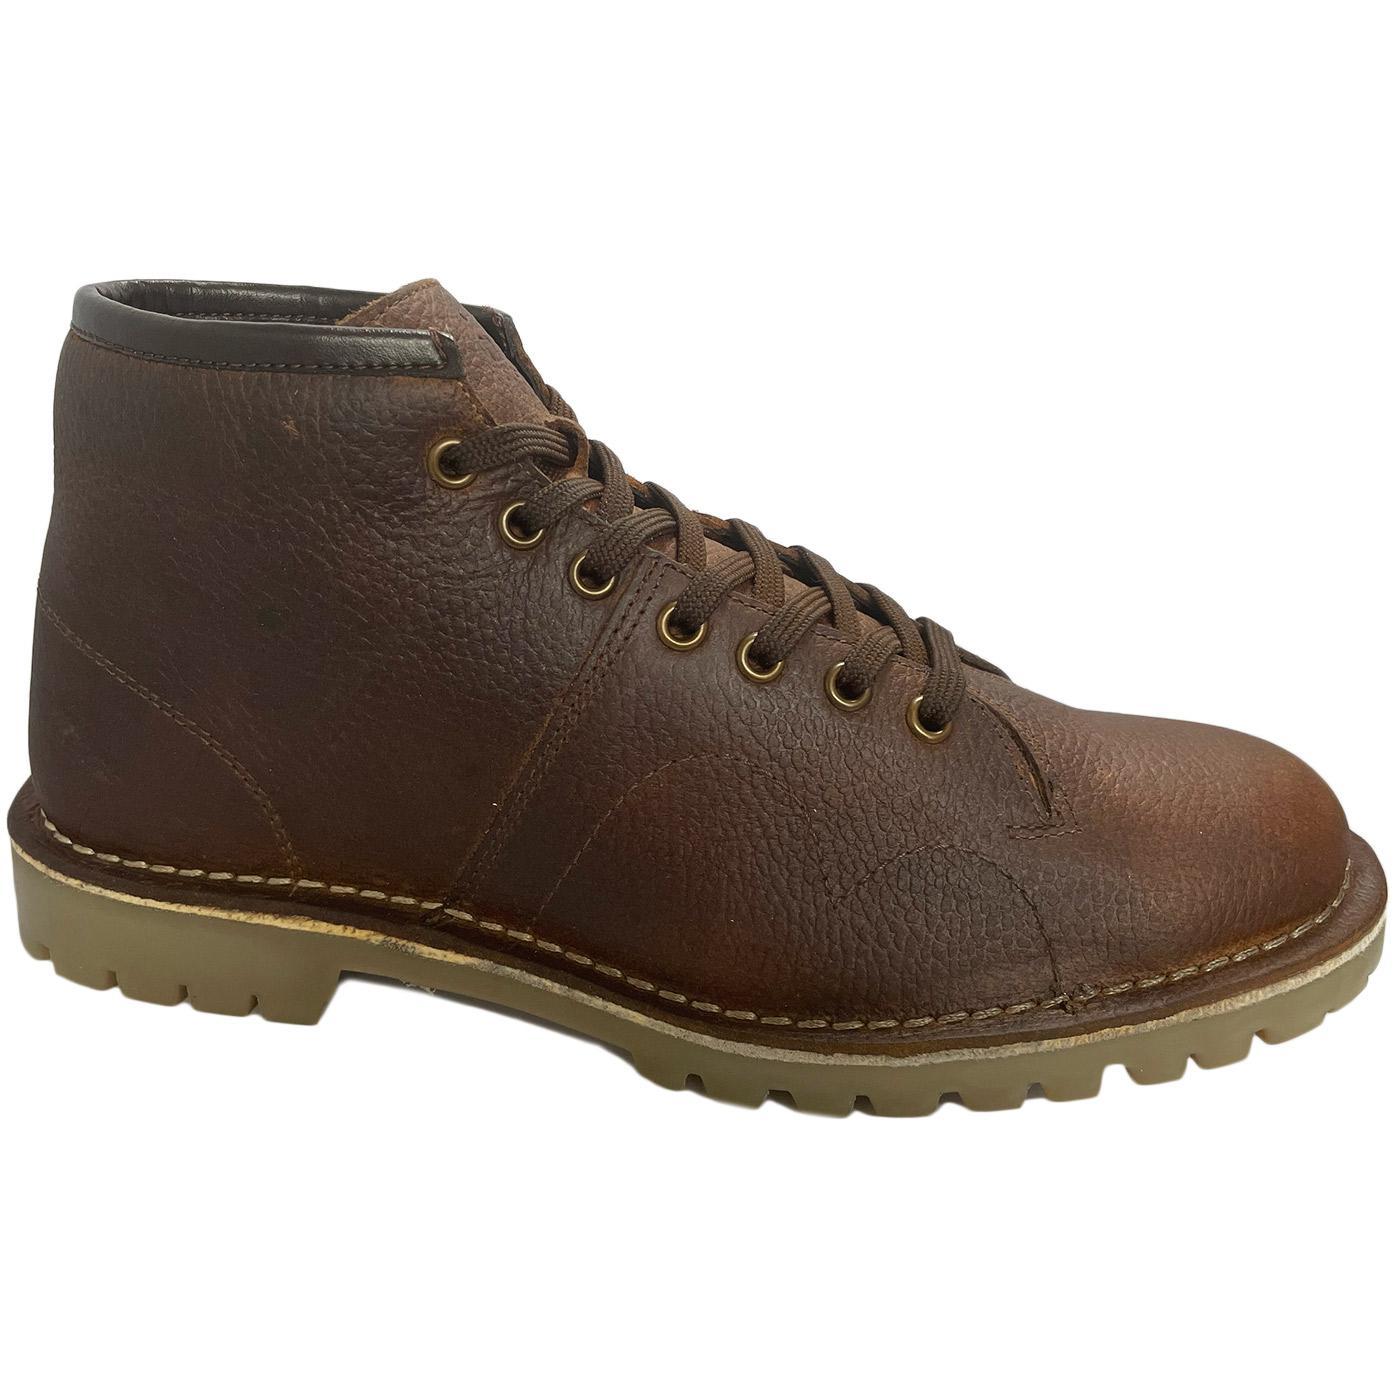 Men's Retro Mod Tumbled Leather Monkey Boots BROWN